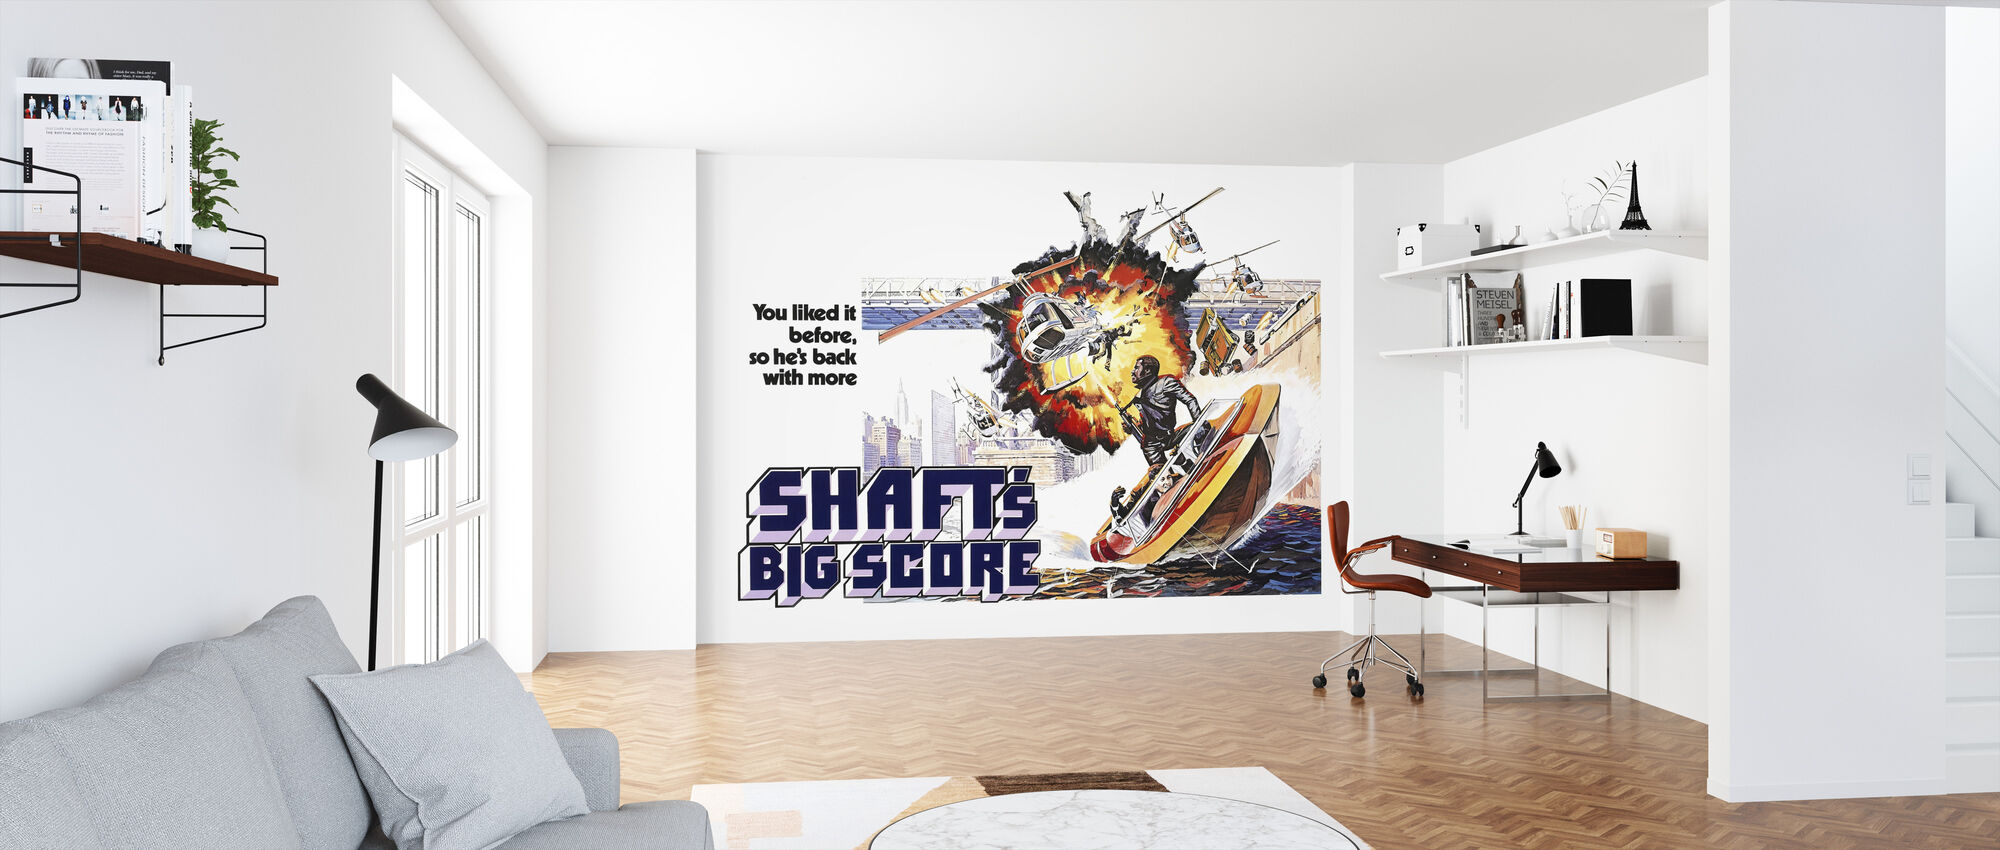 Shafts Big Score - Gordon Parks - Wallpaper - Office